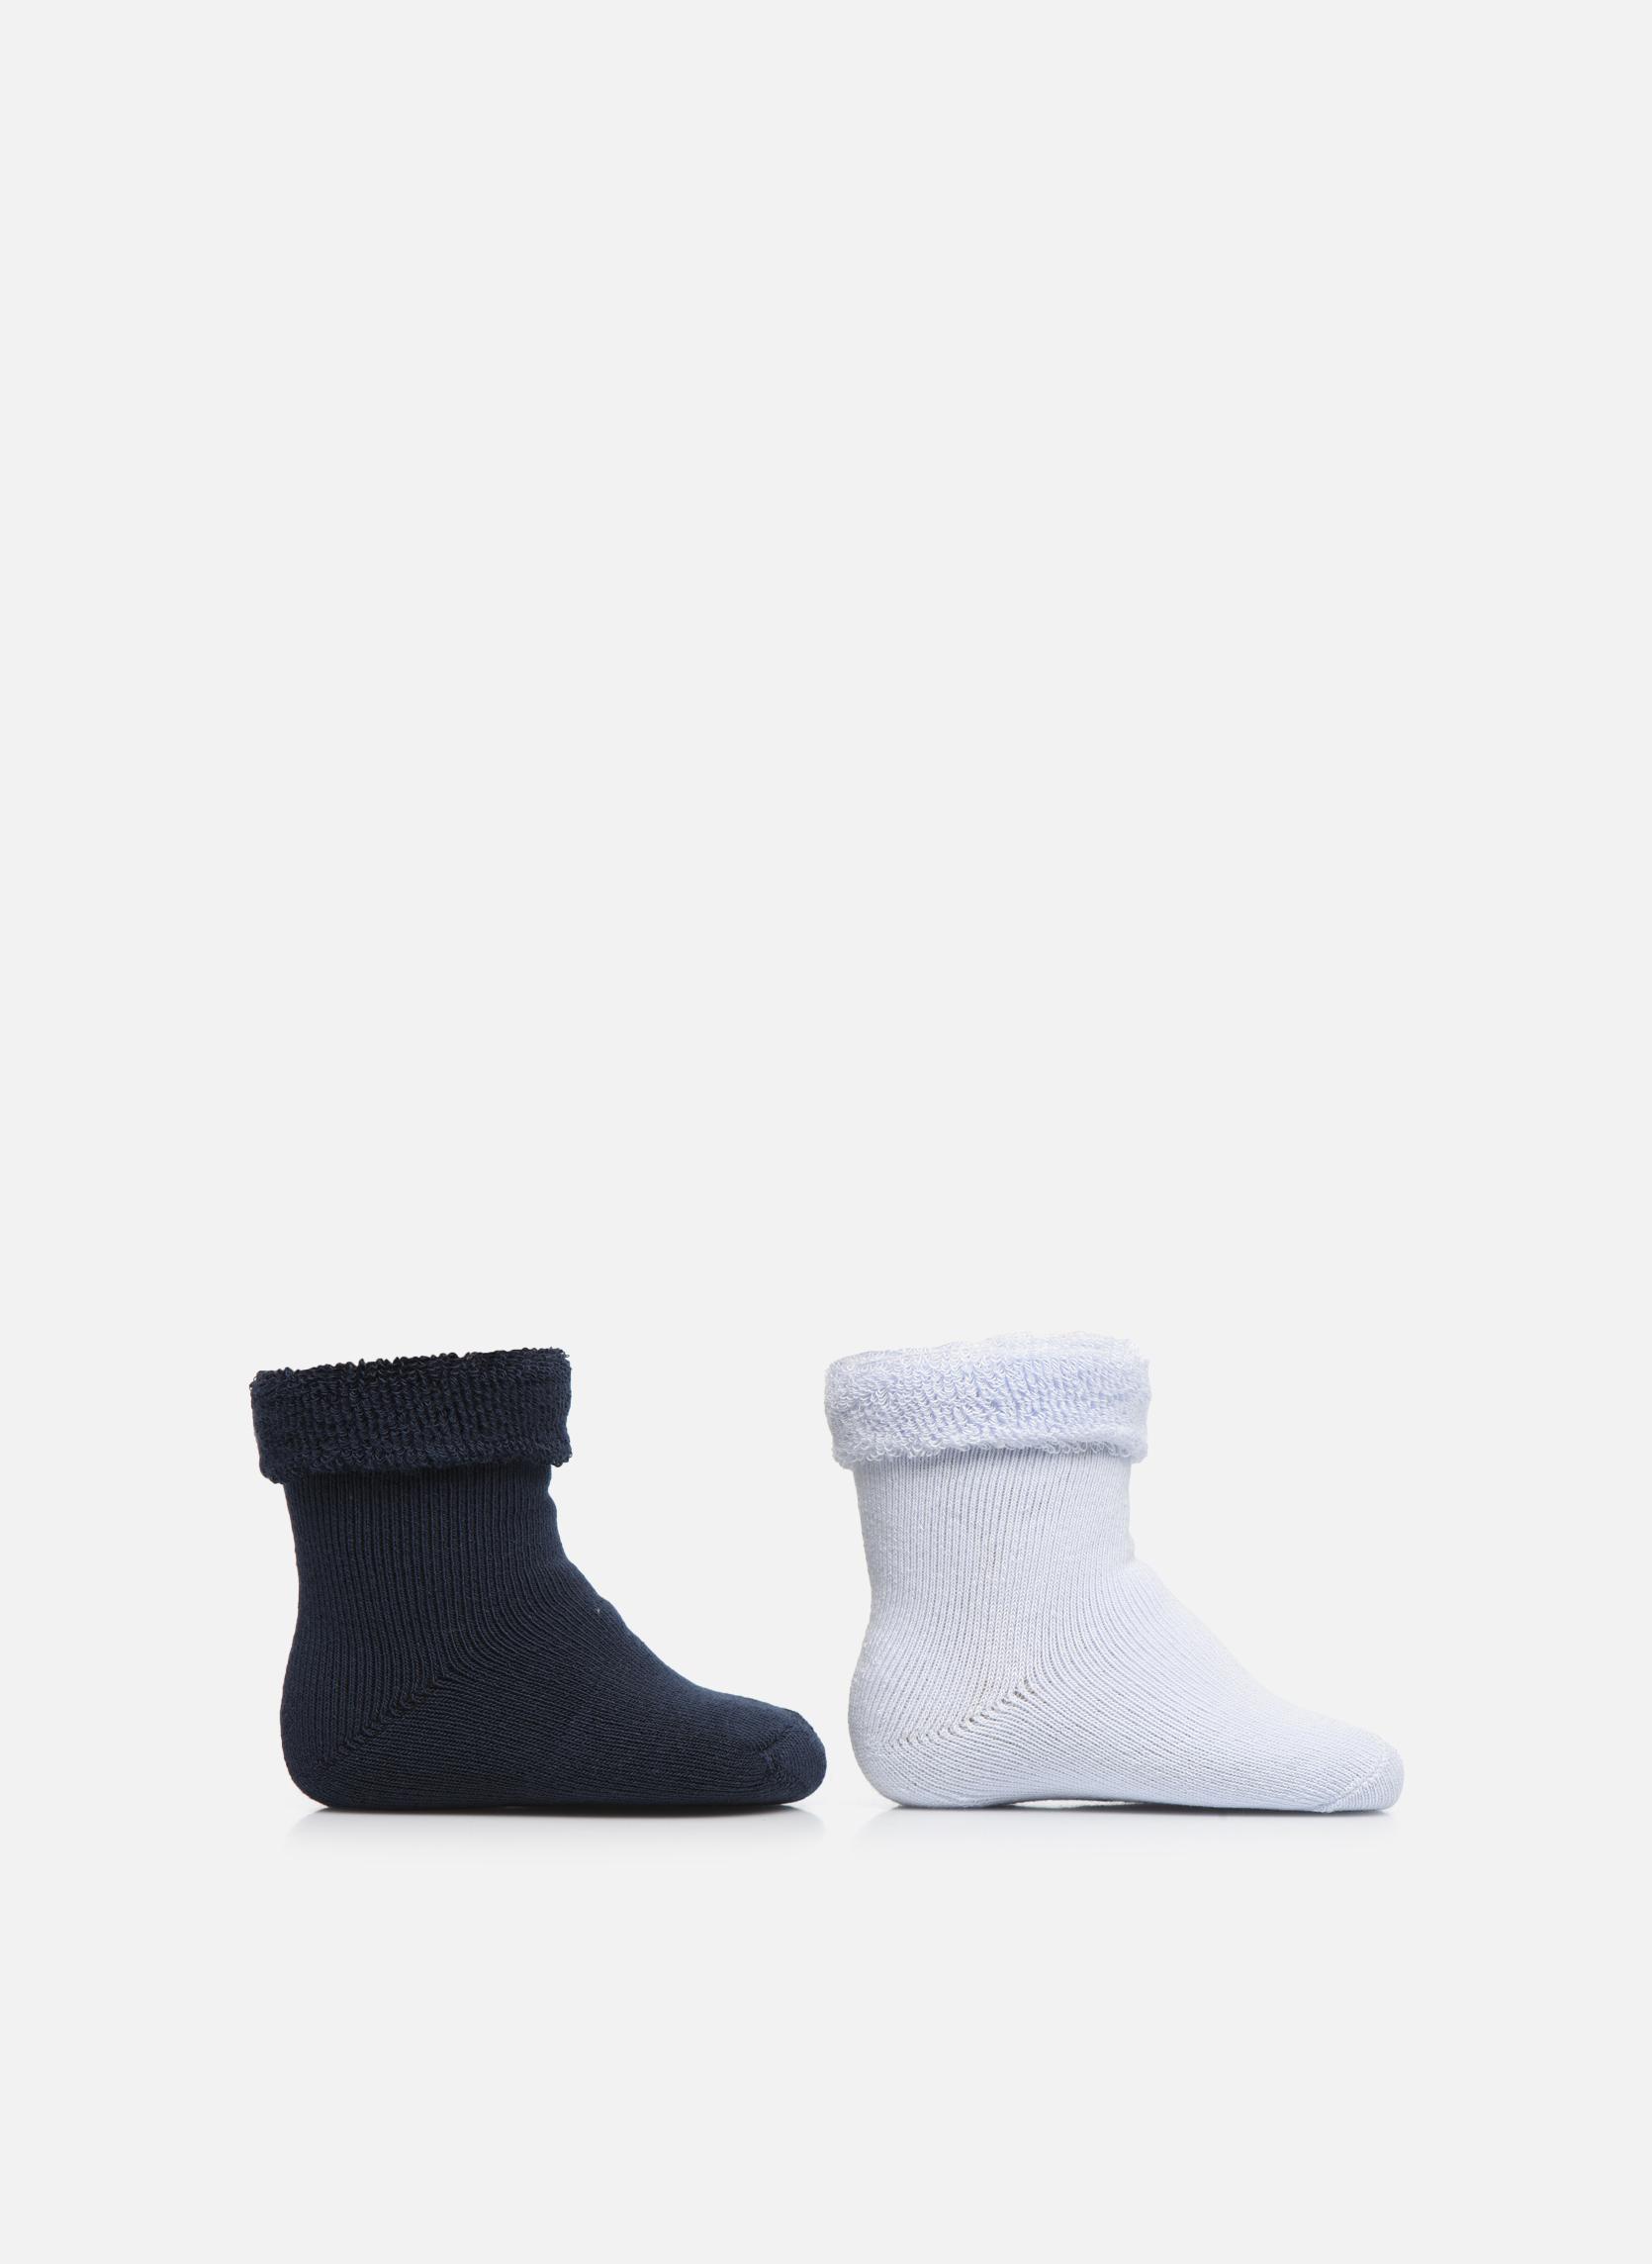 Sokken en panty's Accessoires Sokken Baby 2-pack